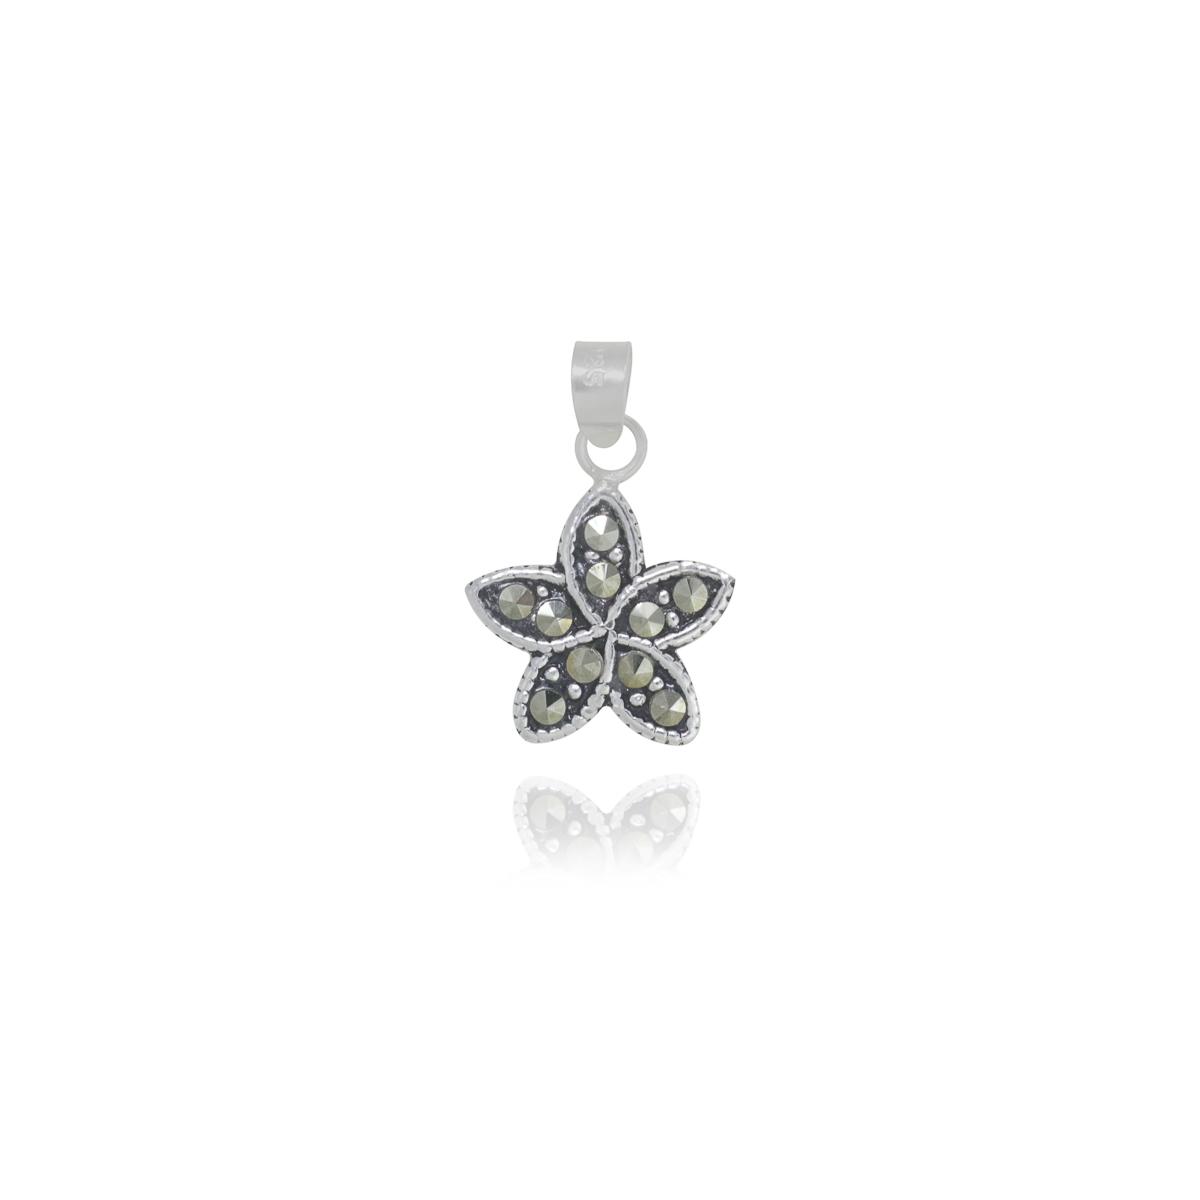 Pingente joia prata 925 pura flor marcassita hipoalergênica